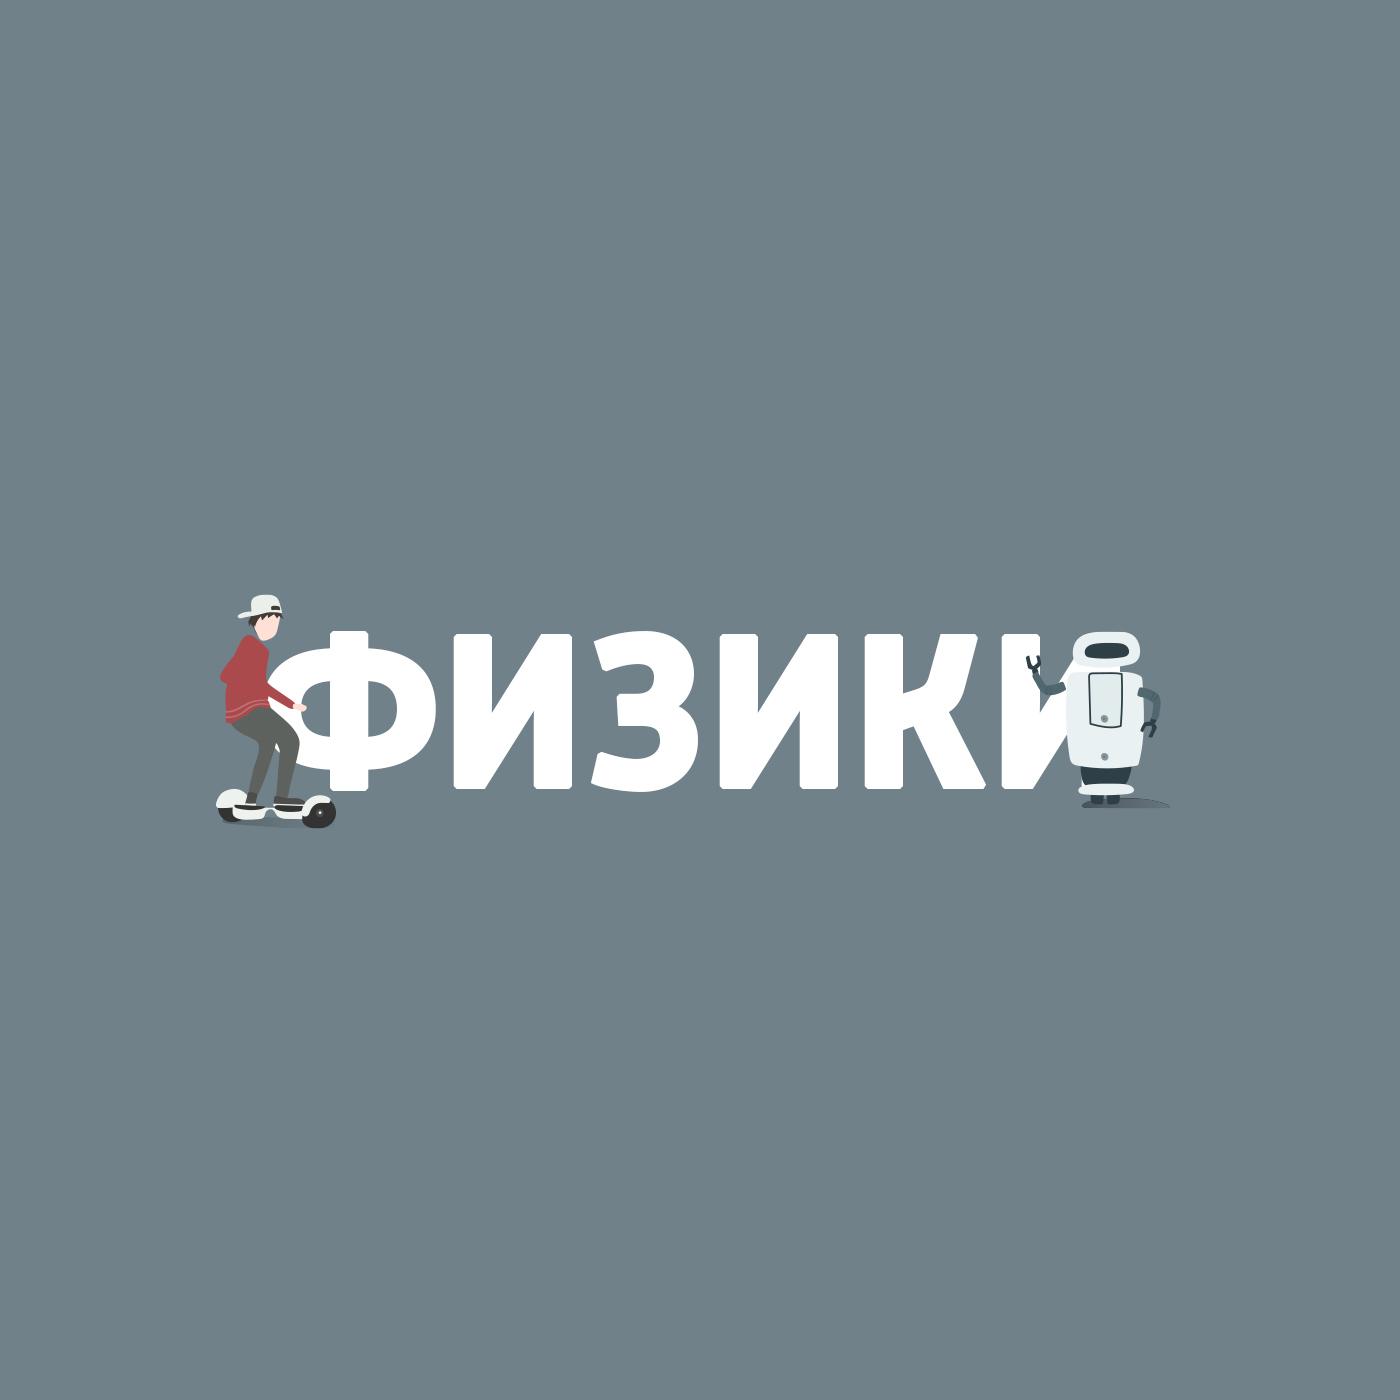 Маргарита Митрофанова Вся правда о Марсе антон первушин империя сергея королёва